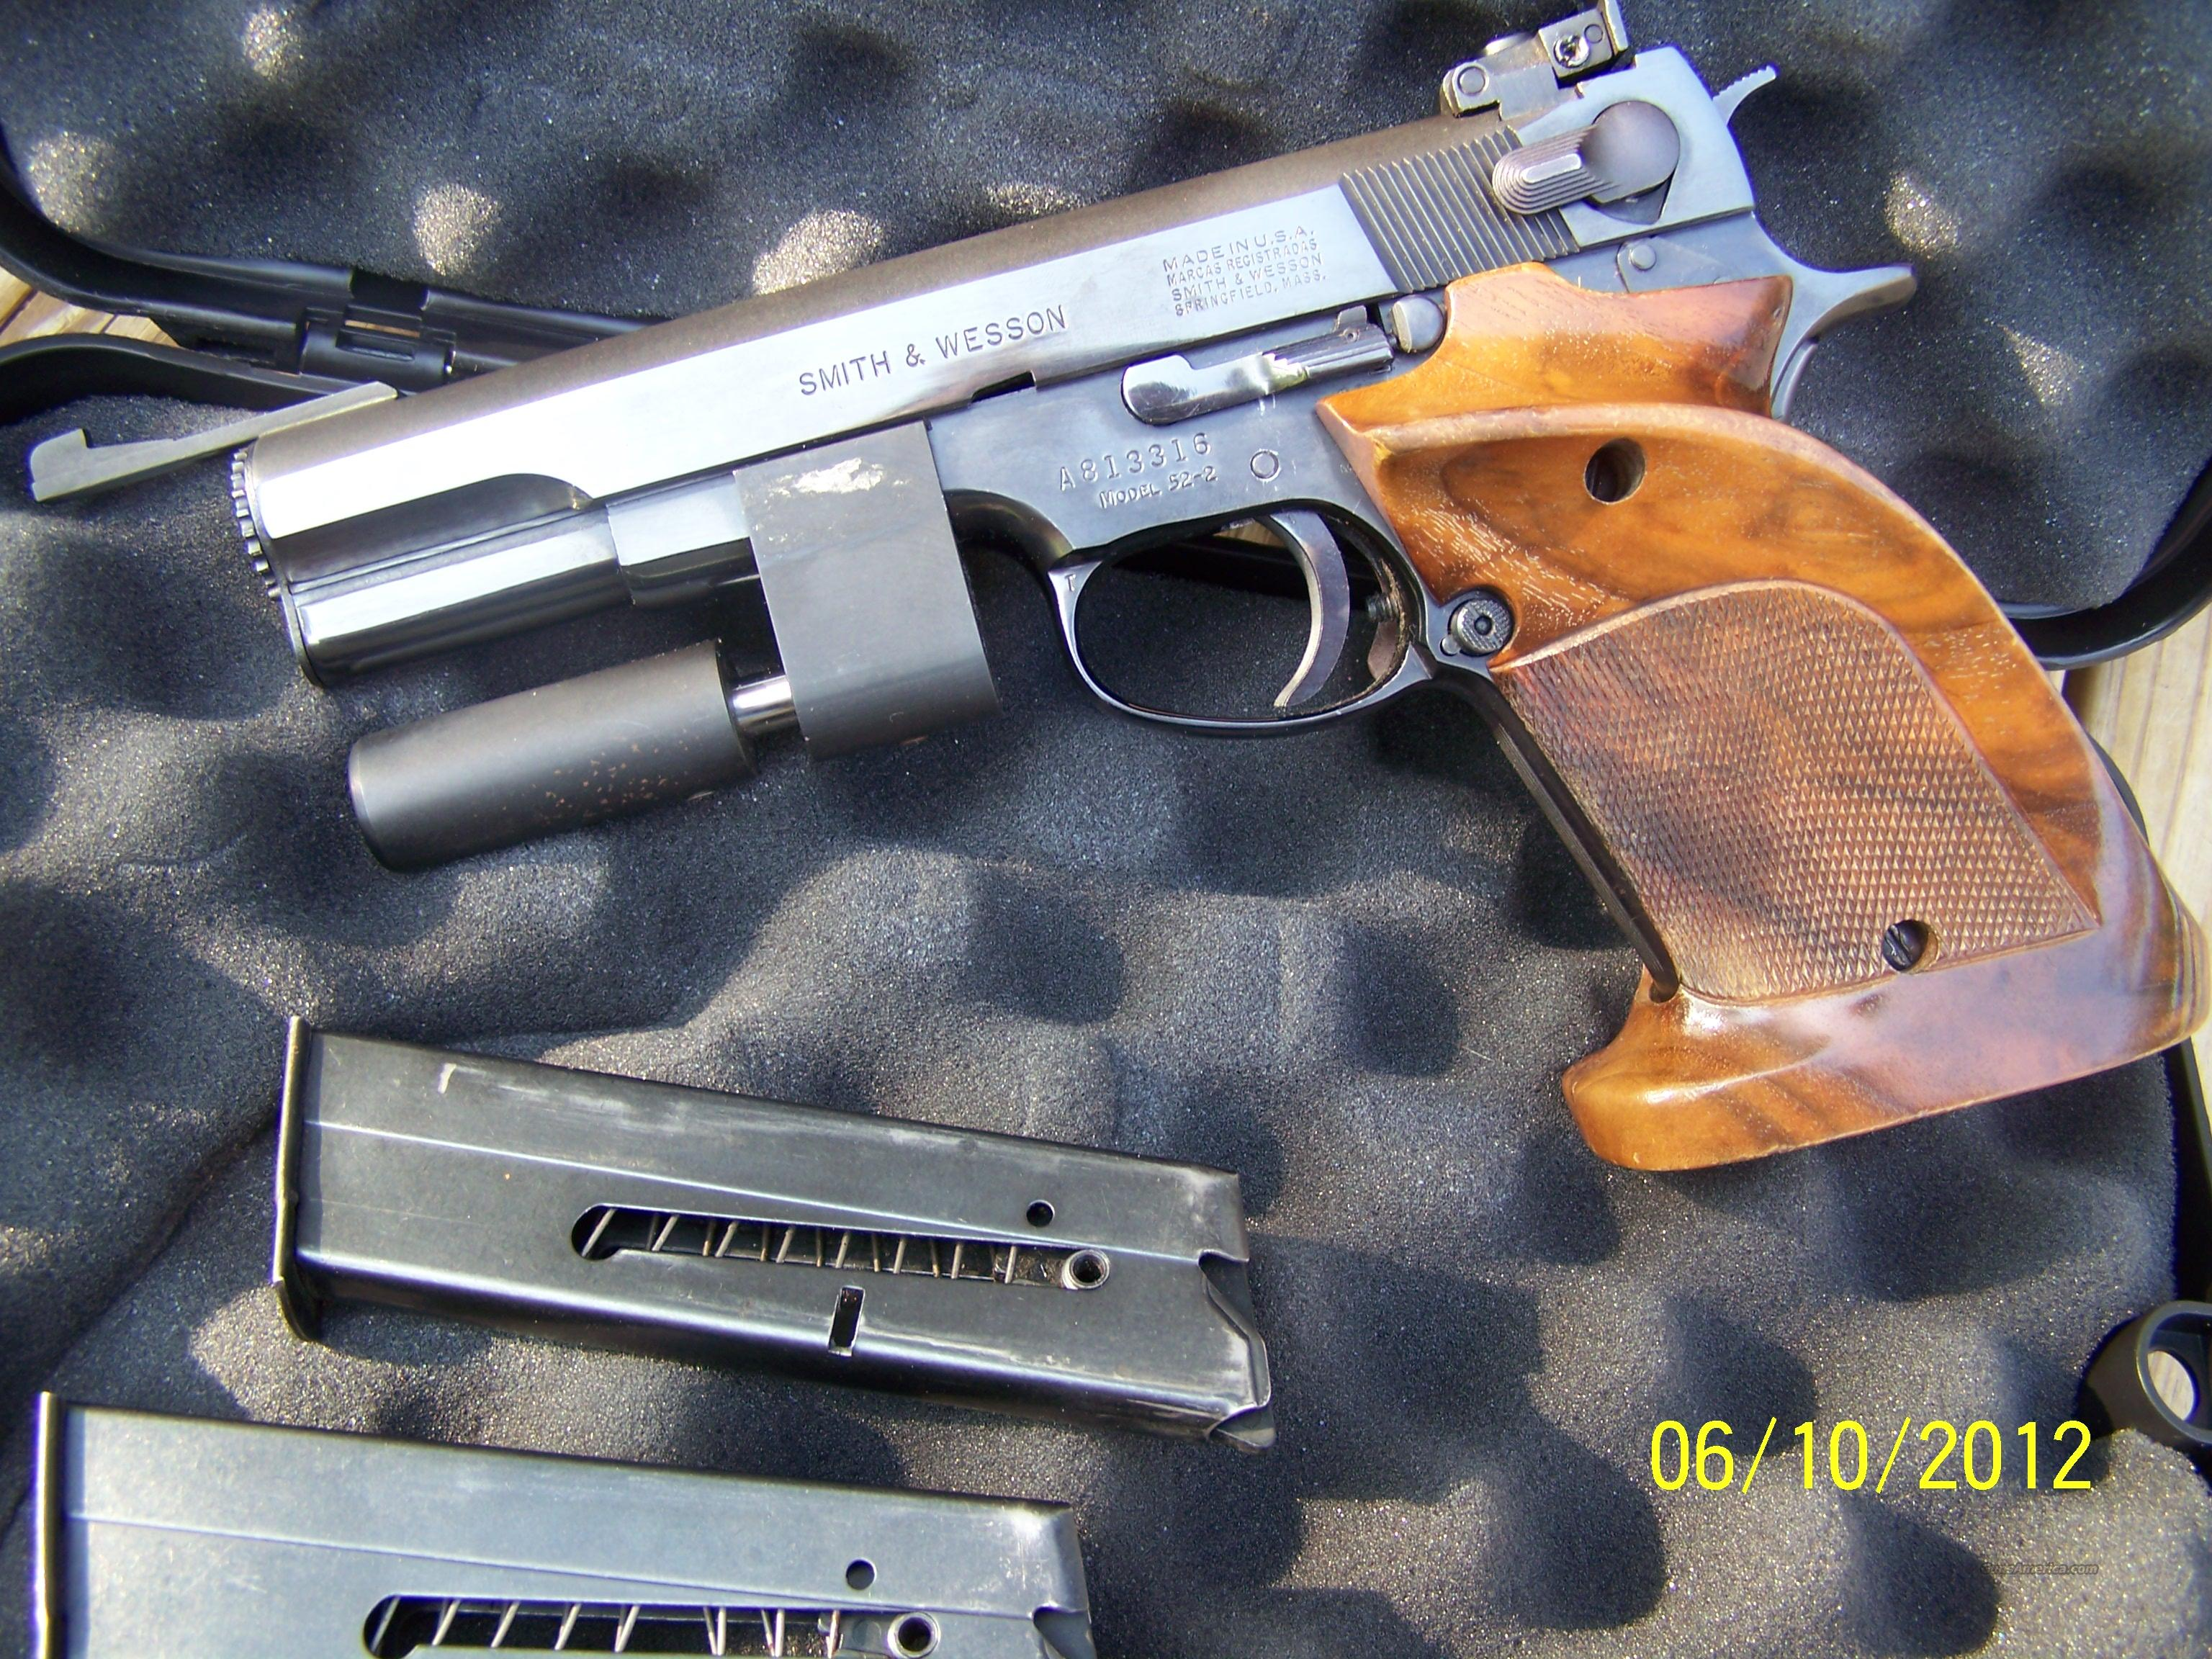 SMITH & WESSON Mod 52-2 .38 SPEC WC  Guns > Pistols > Smith & Wesson Pistols - Autos > Steel Frame